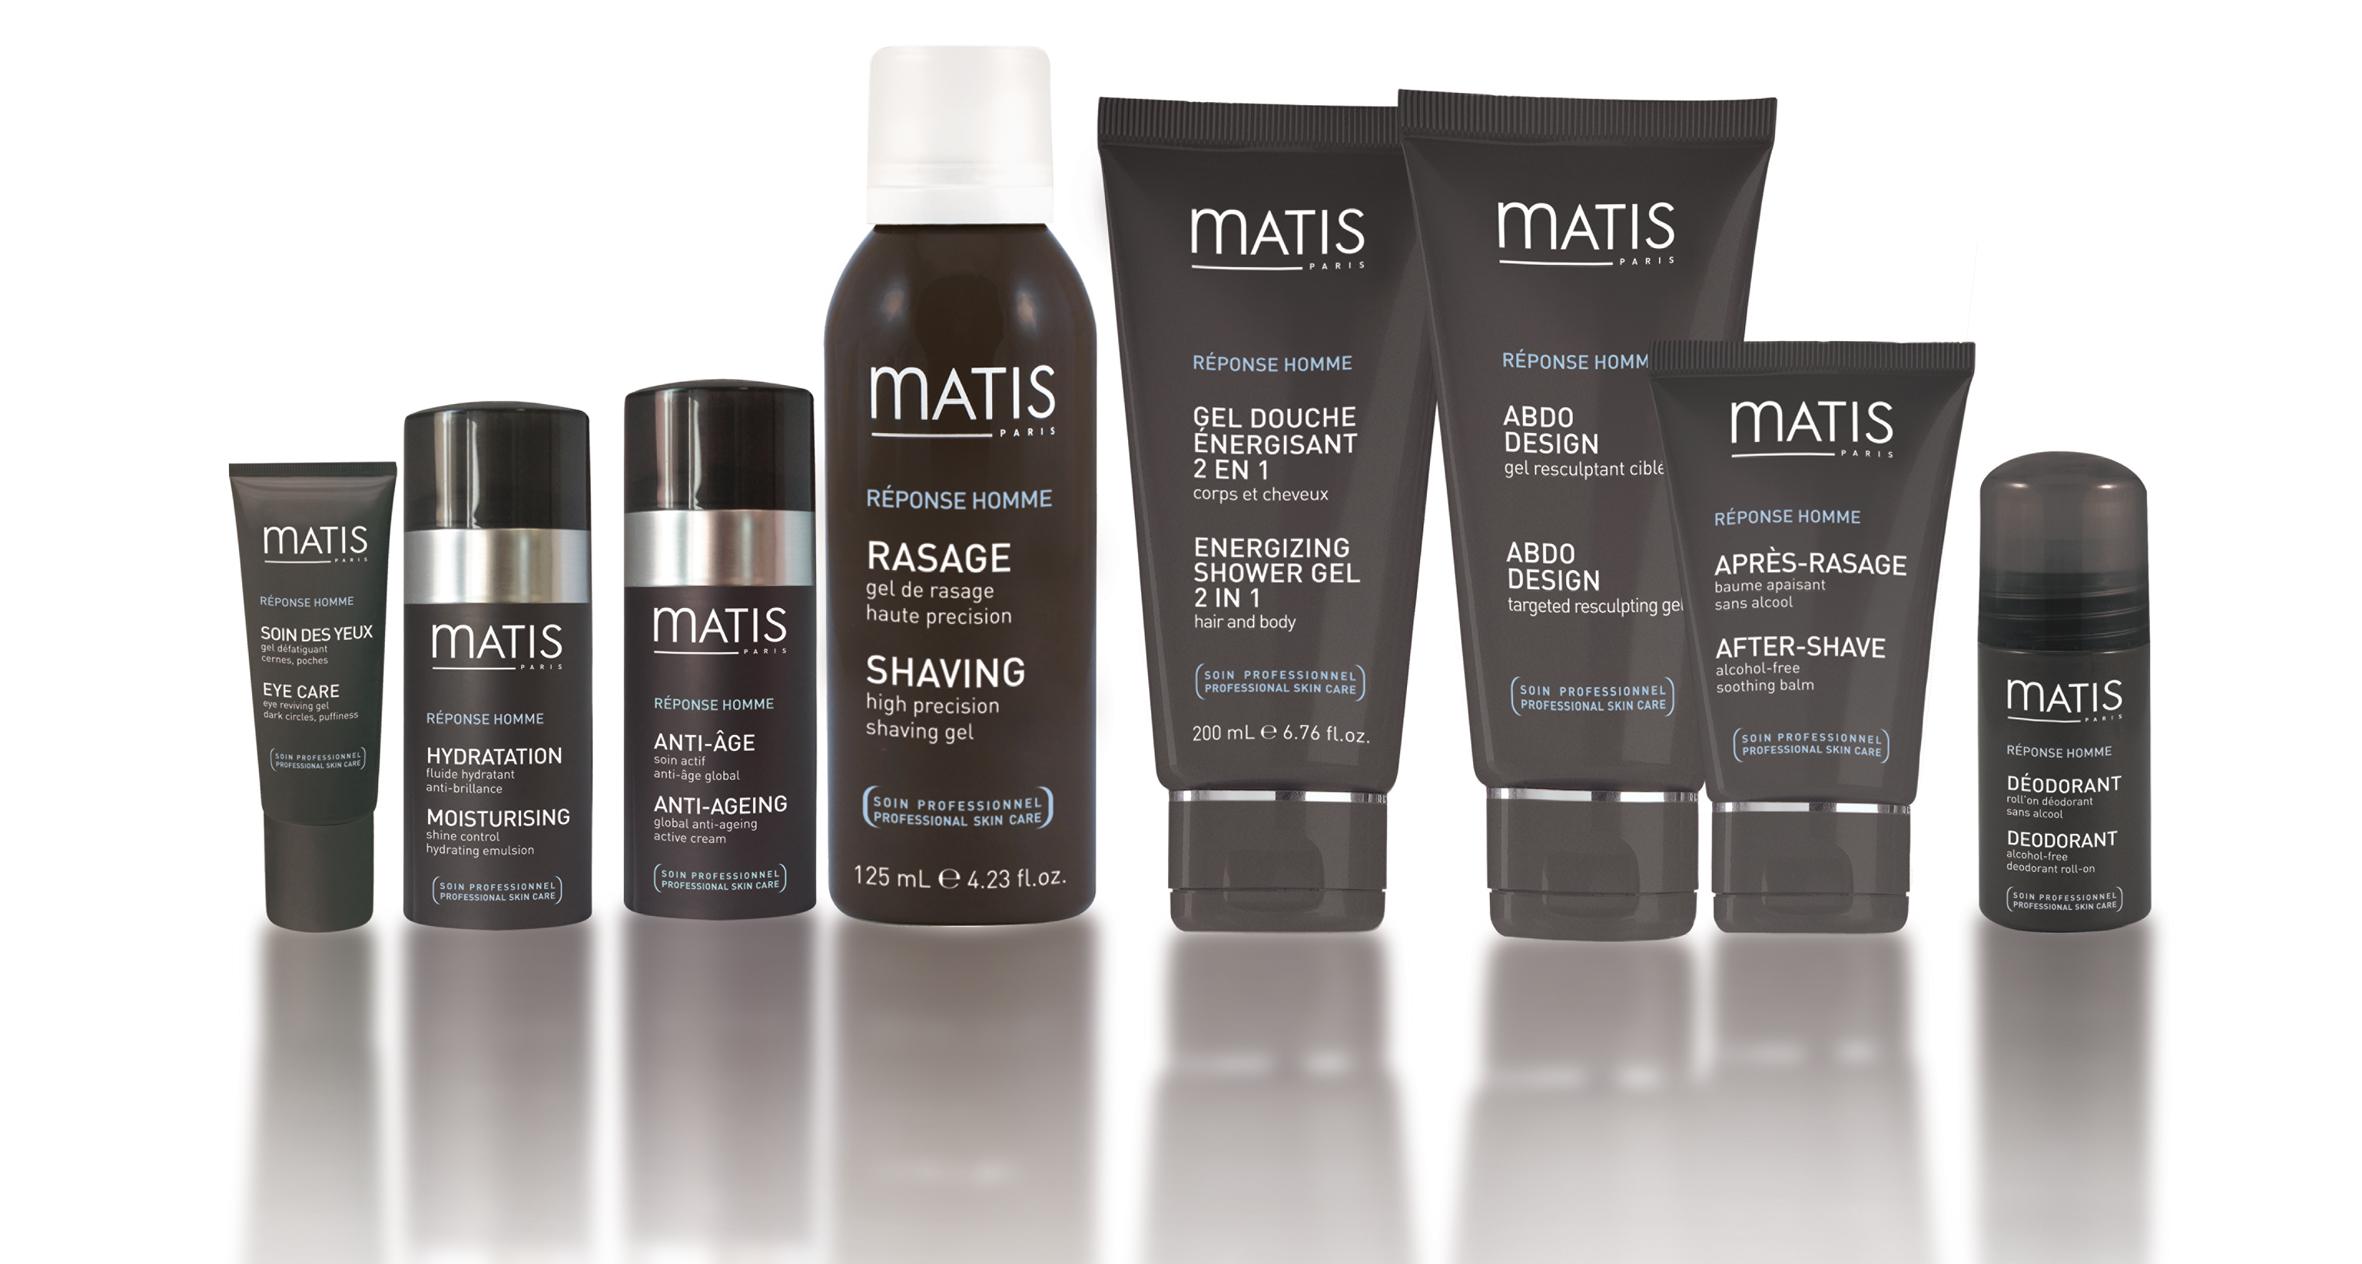 Matis_RH_Produktgruppe.jpg